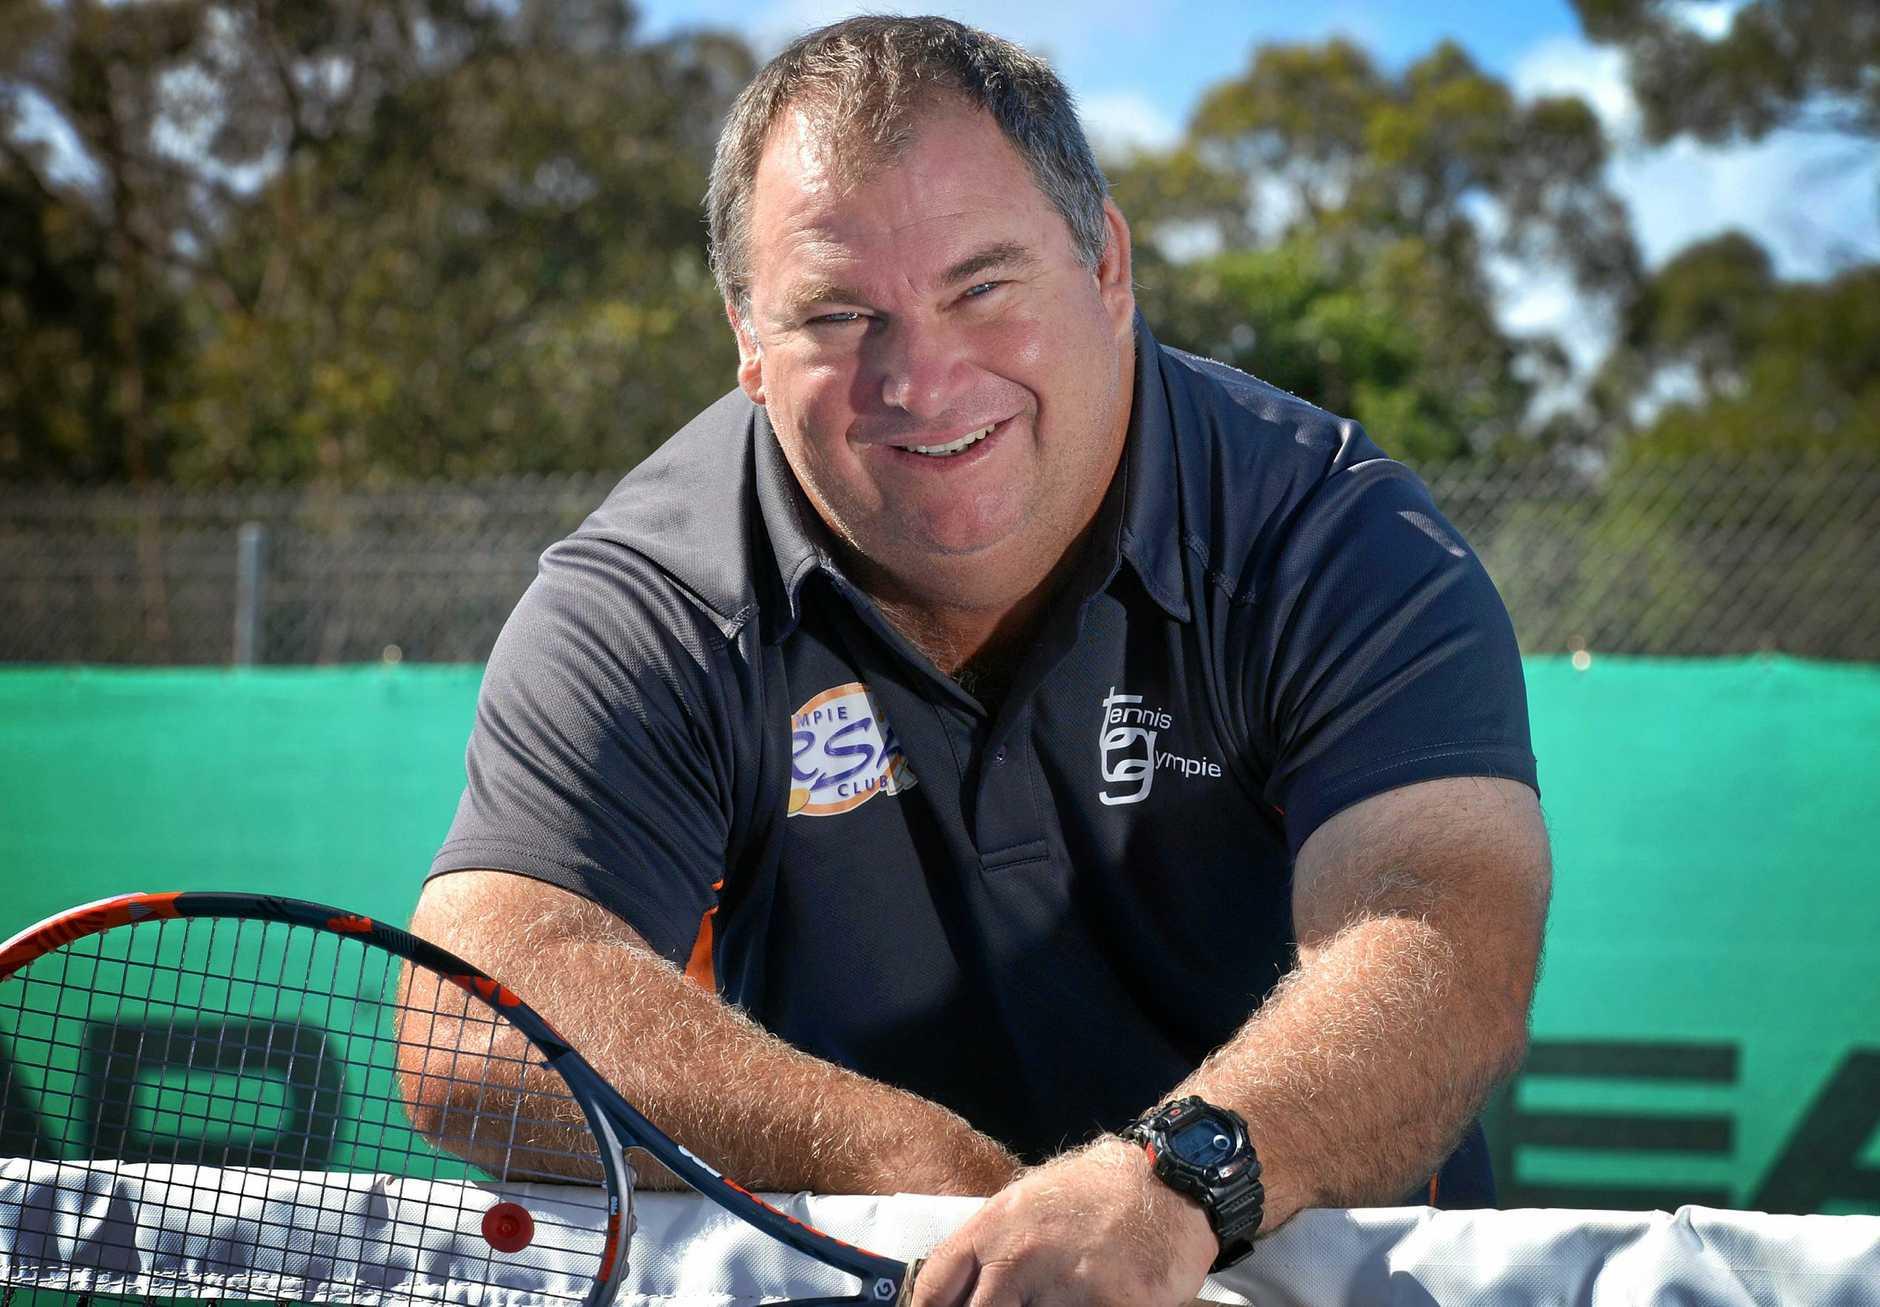 Brett Cottrill Gympie Tennis club coach.